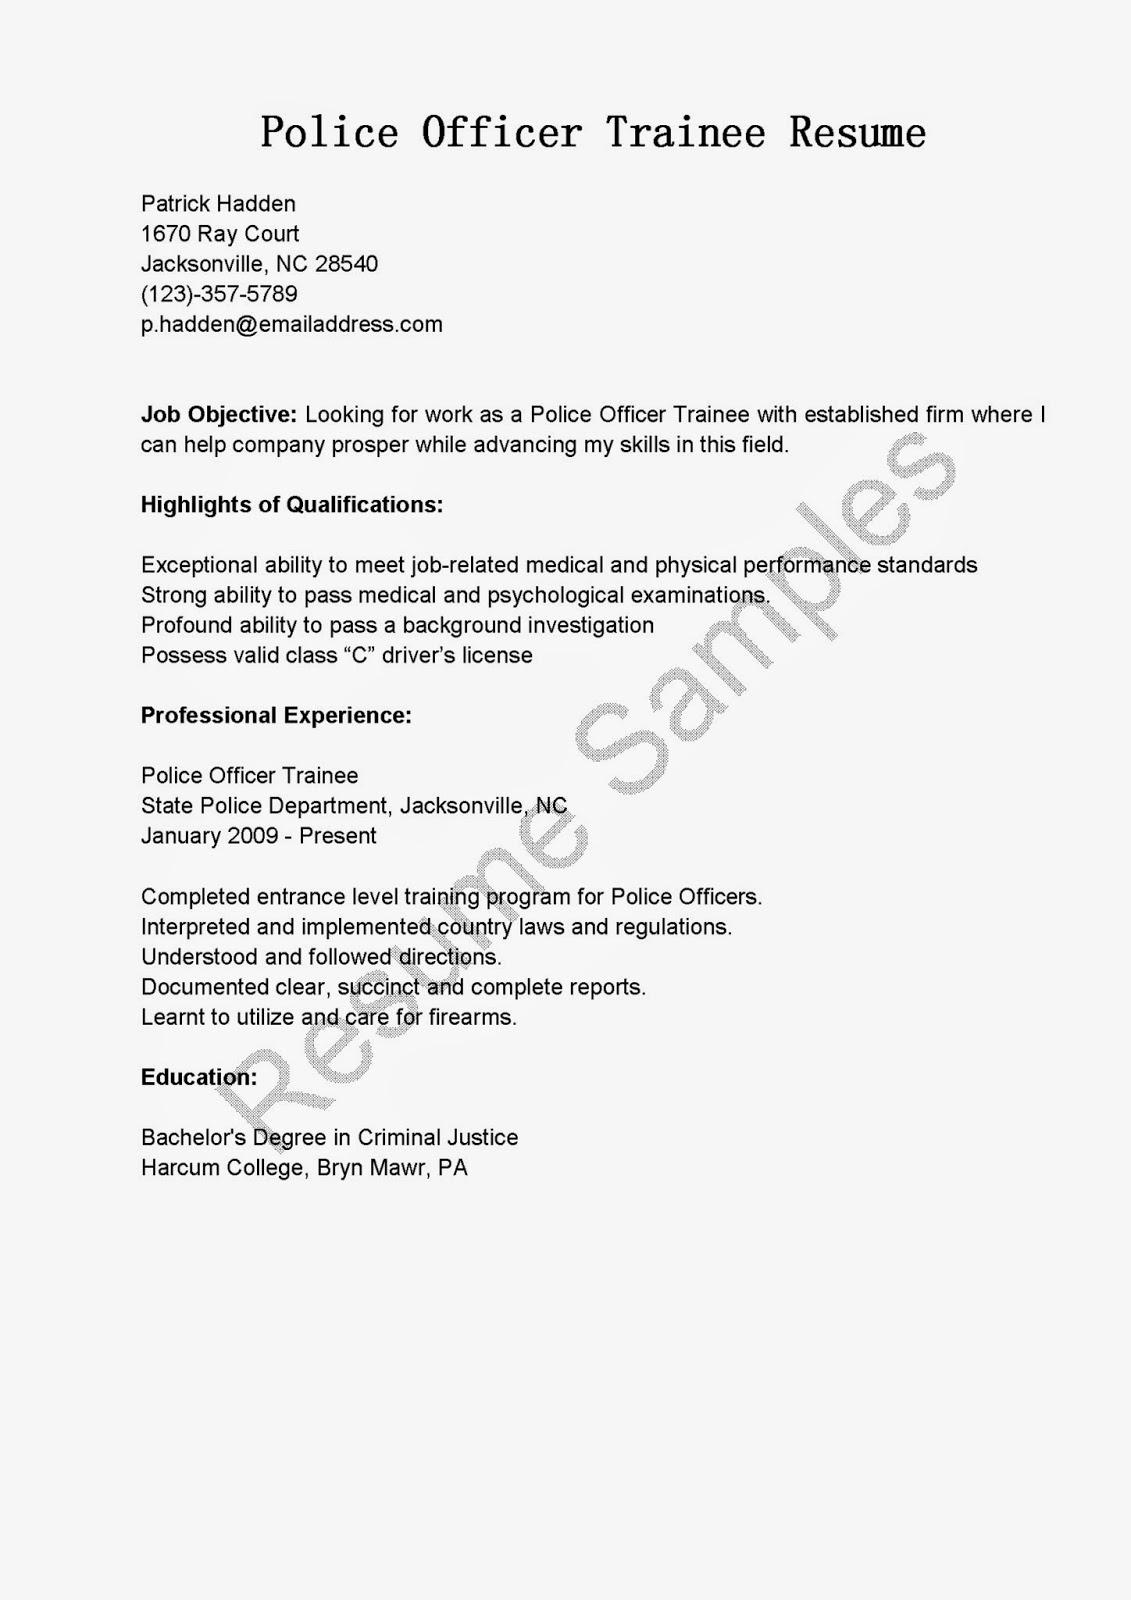 sample police officer resume sample police officer resume makemoney alex tk